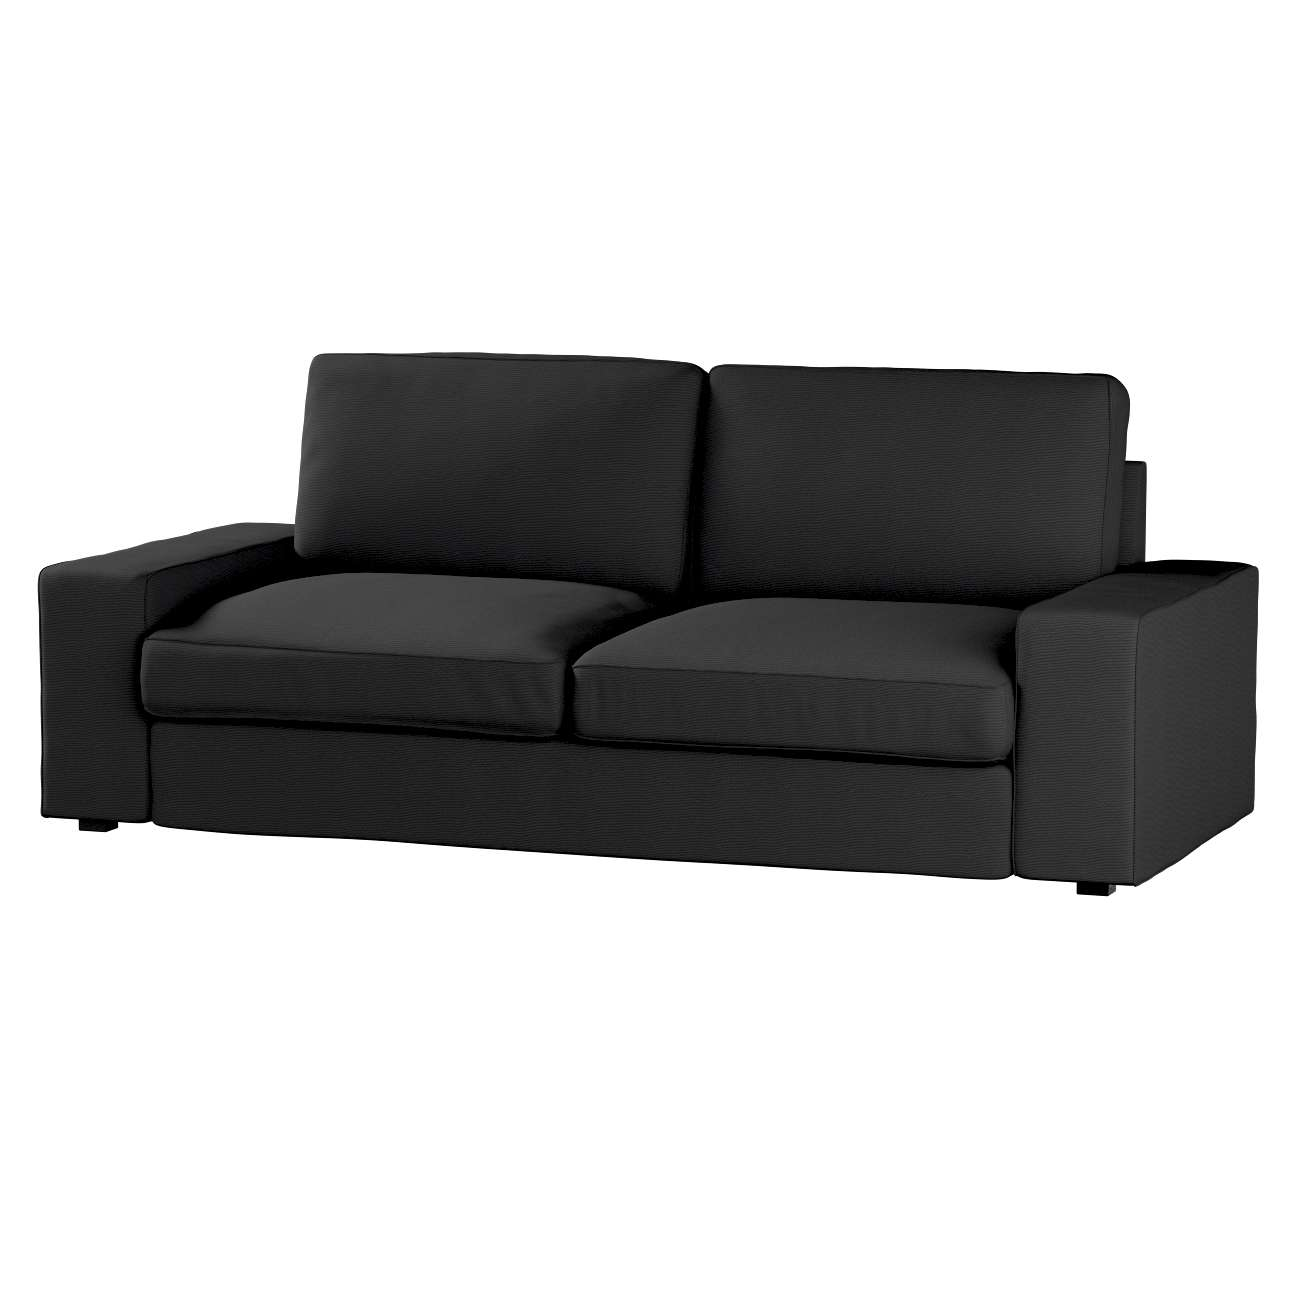 Kivik 3-Sitzer Sofabezug Sofa Kivik 3-Sitzer von der Kollektion Etna, Stoff: 705-00